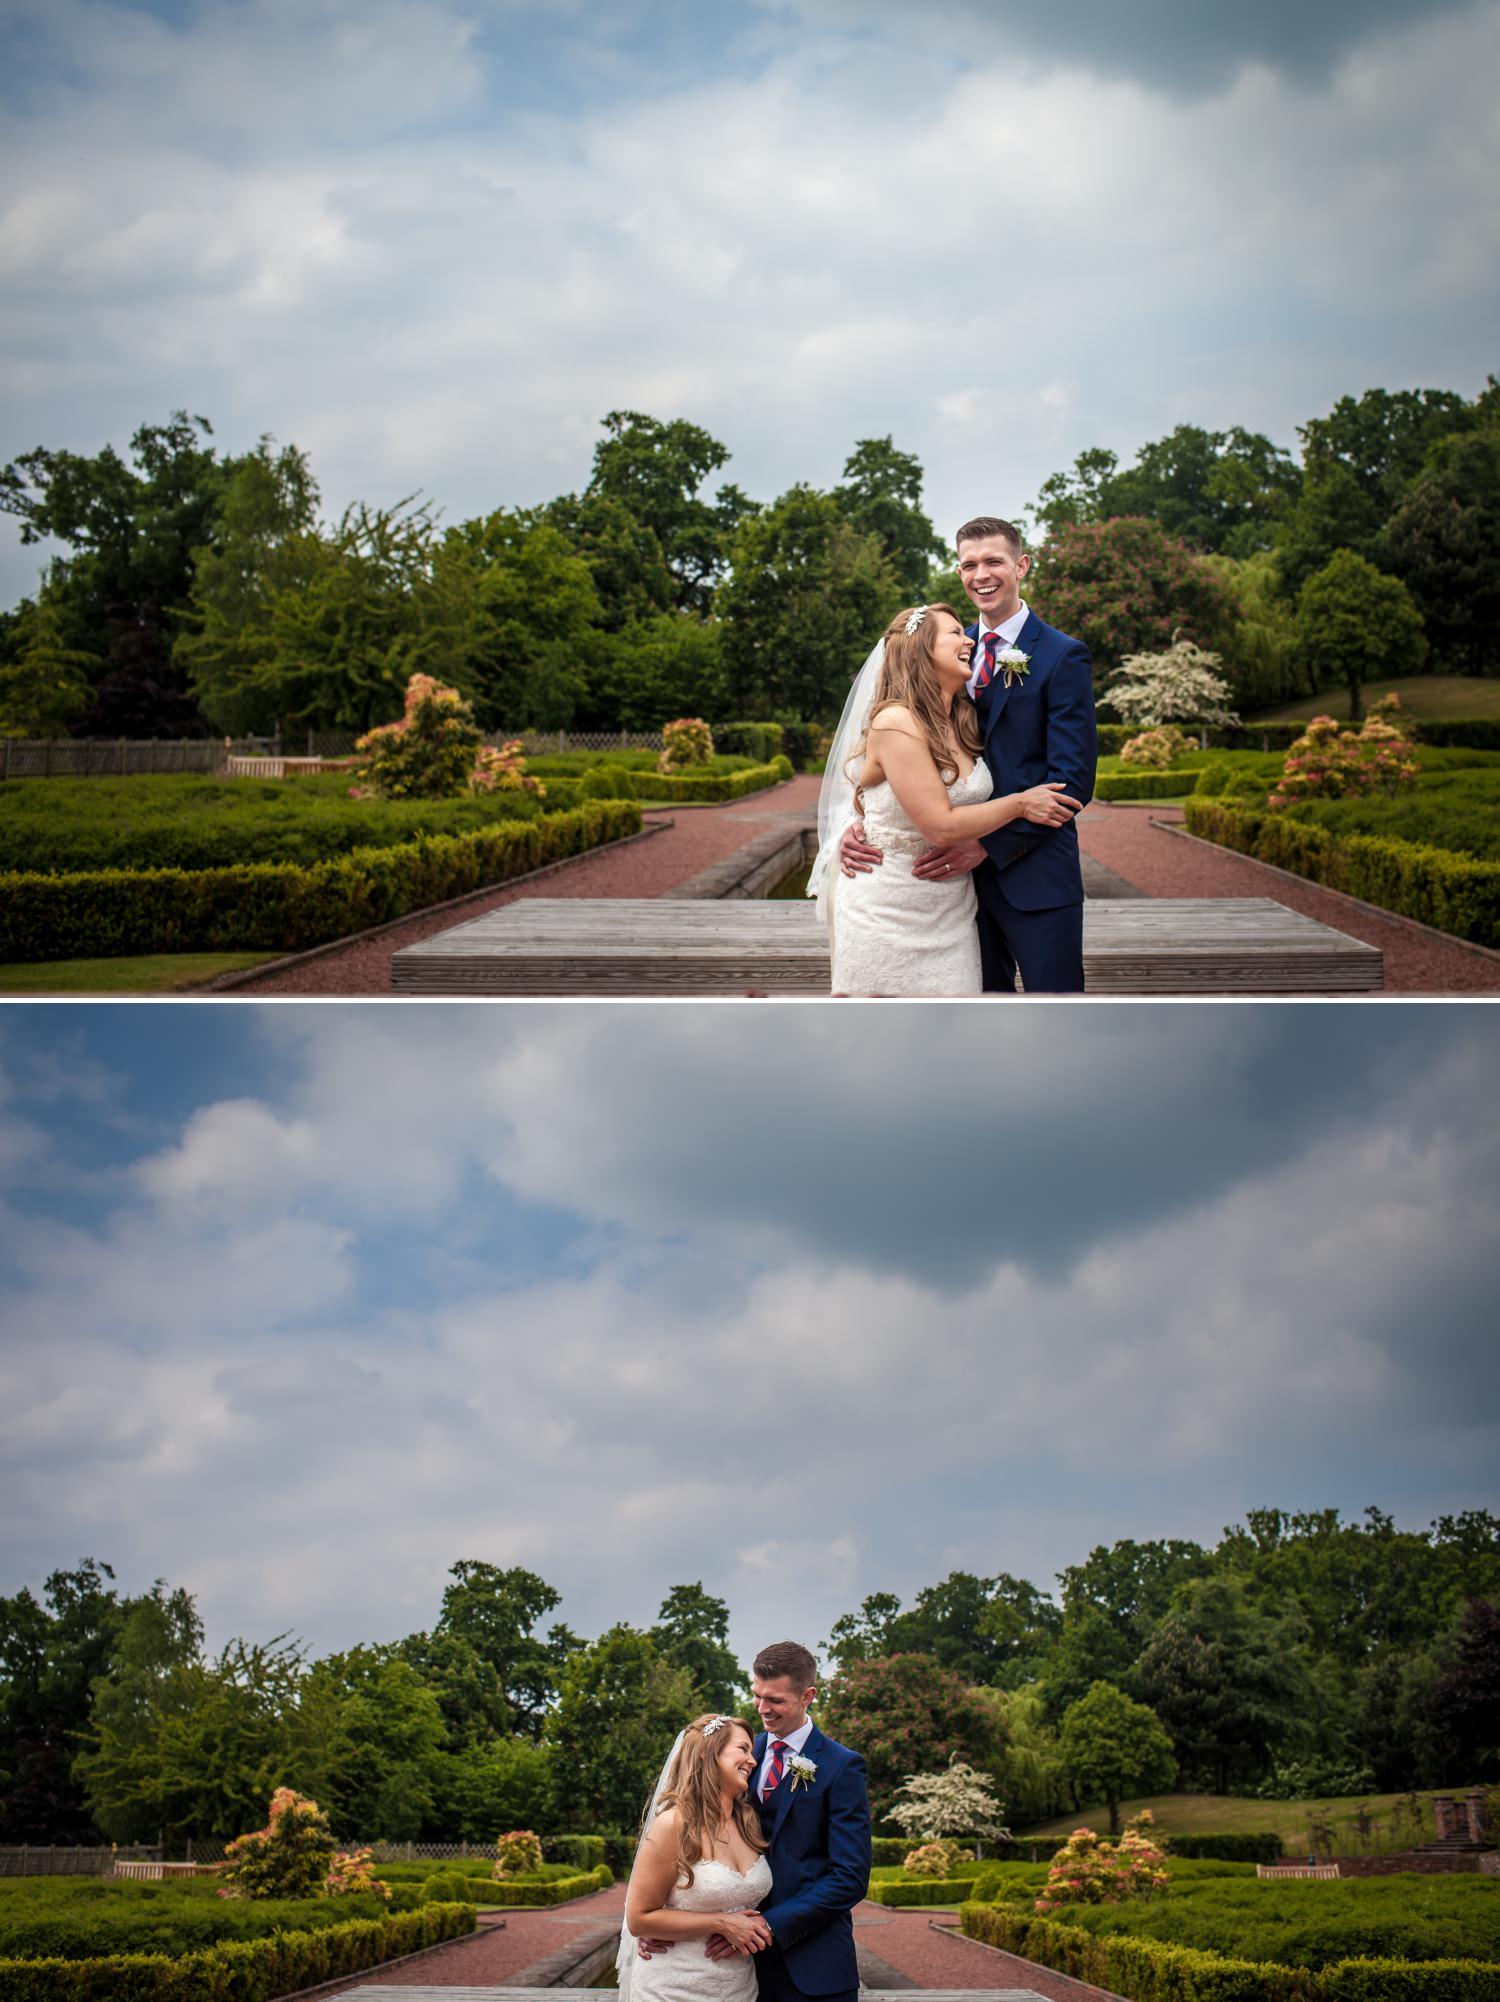 Garden portraits Wedding Photographs at Carden Park